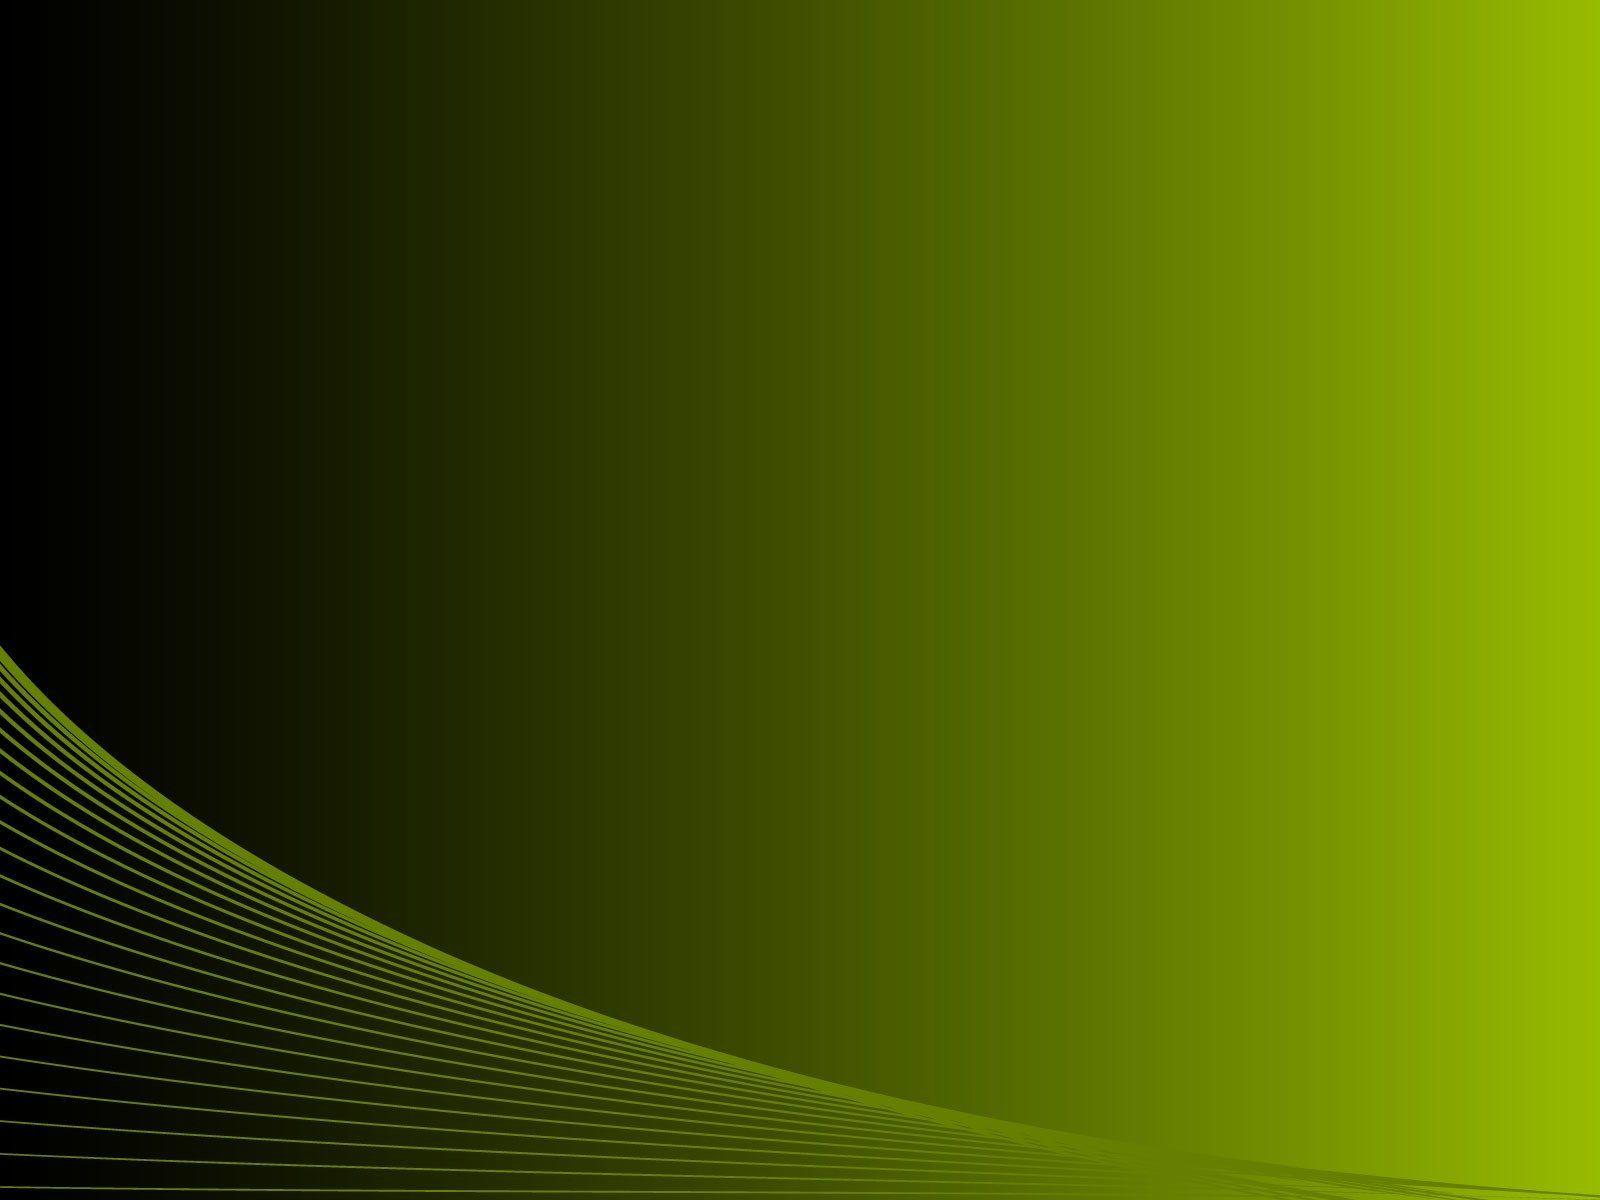 Background animasi olahraga 4 Background Download 1600x1200